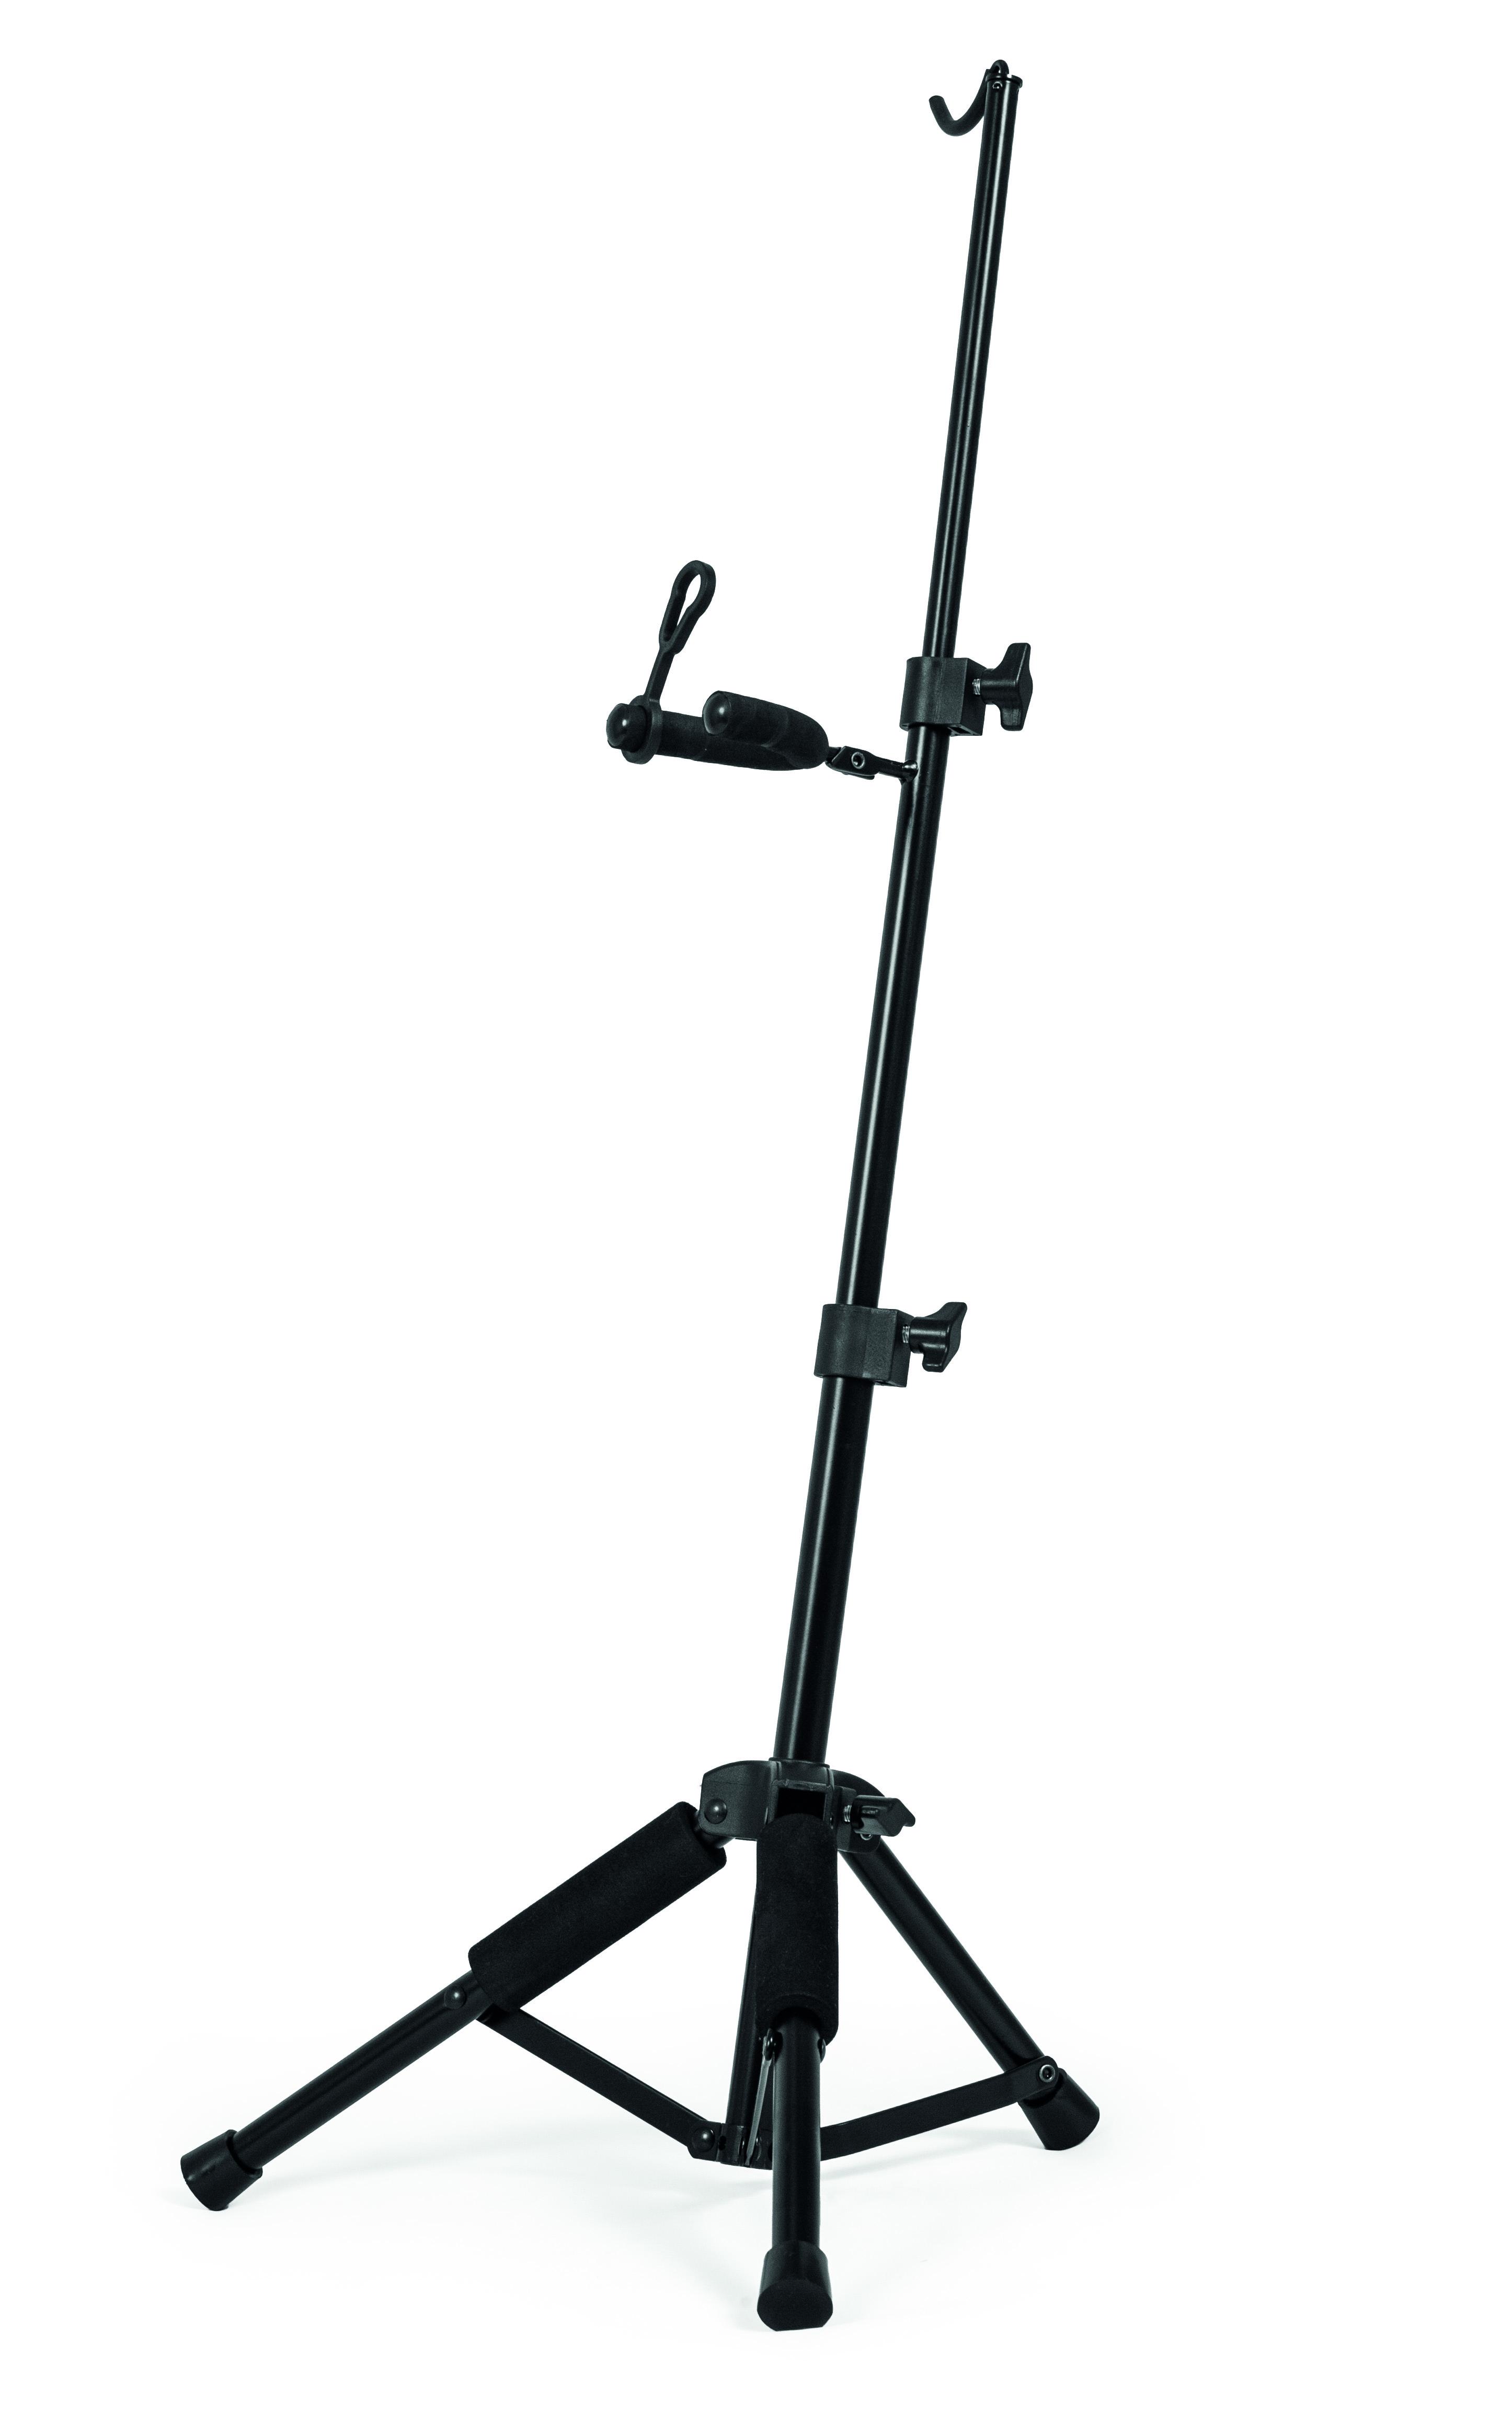 Nomad NIS-C061 Violin Hanging Stand